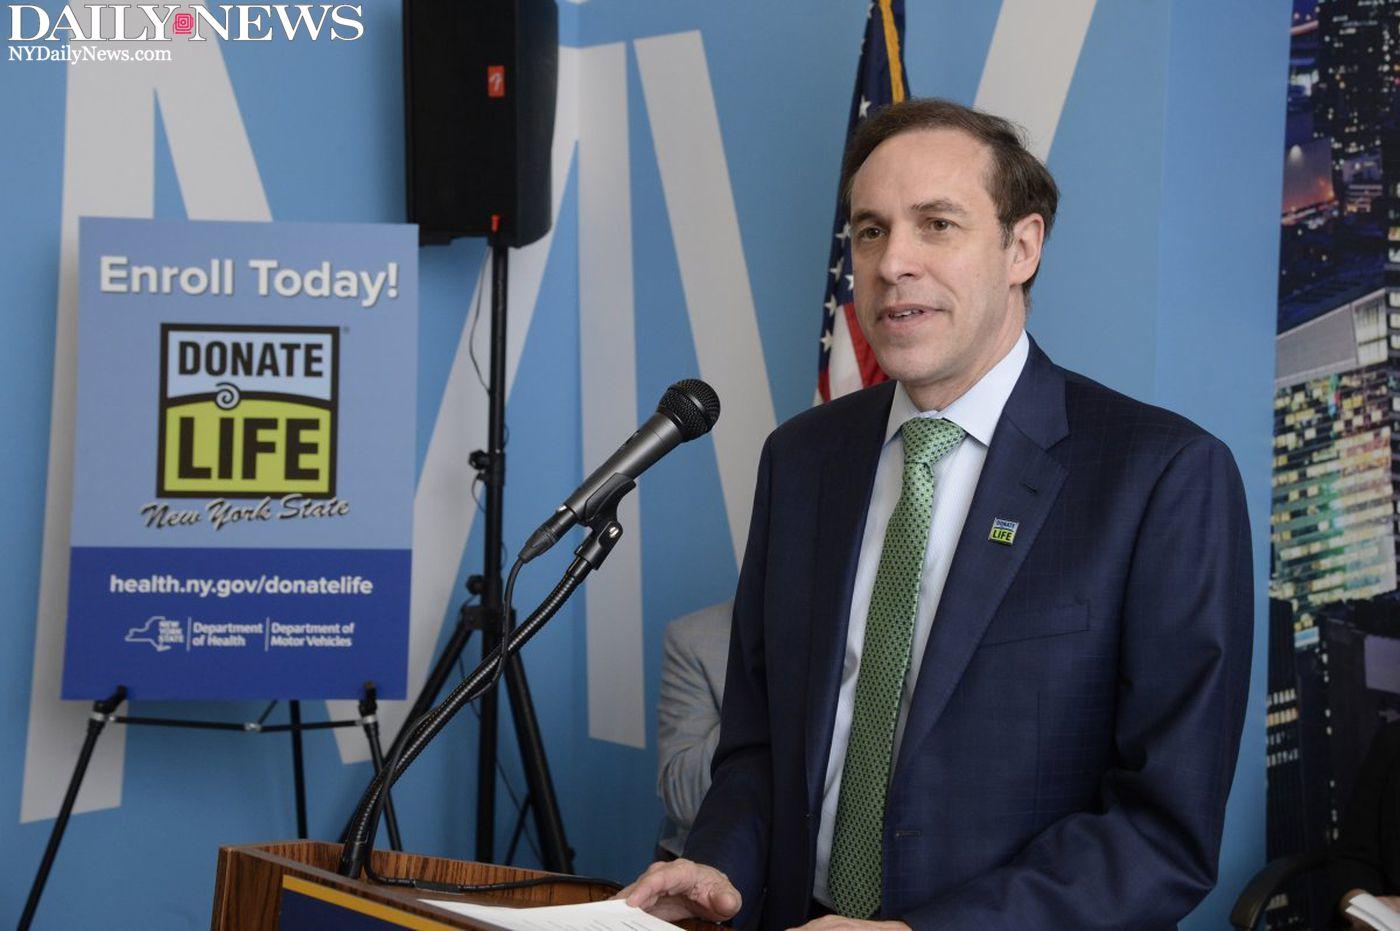 Health Commissioner declares the flu is no longer prevalent in N.Y. https://t.co/XerkQc0KF4 https://t.co/uDQB1aaXG1